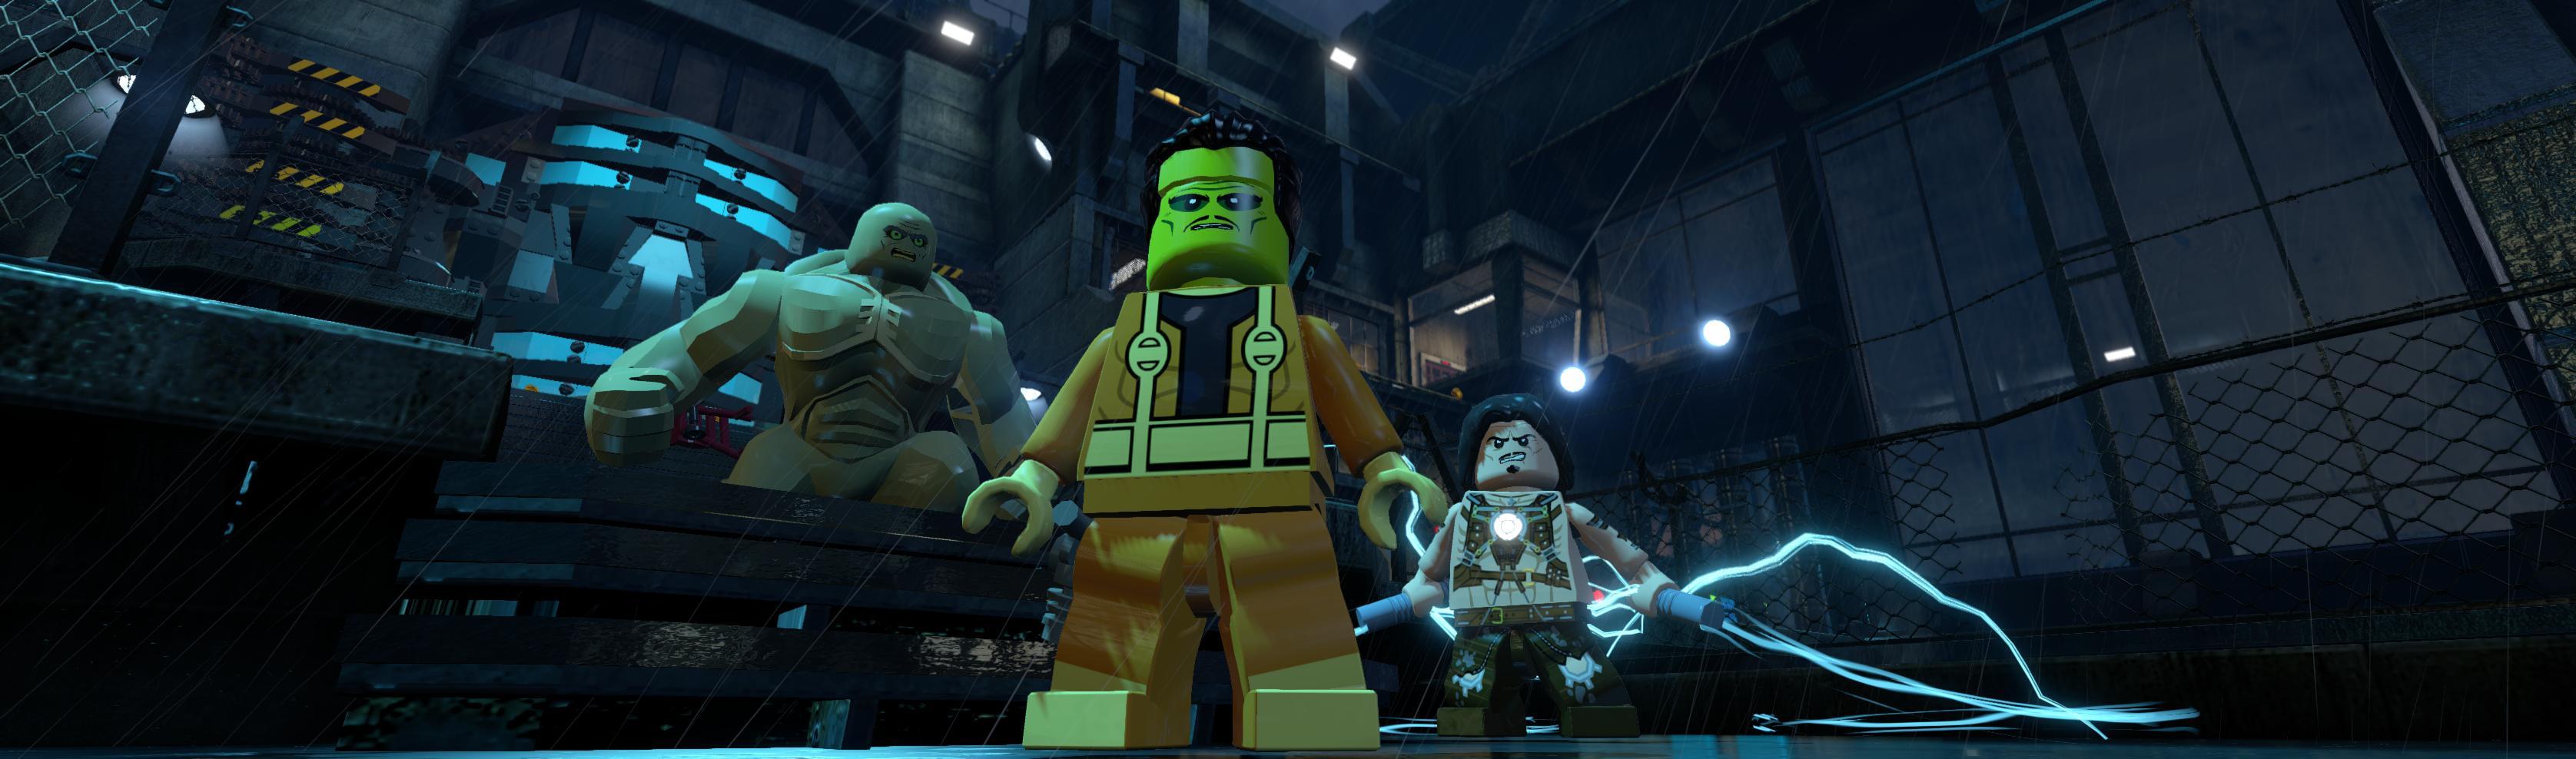 LegoMarvel (12)